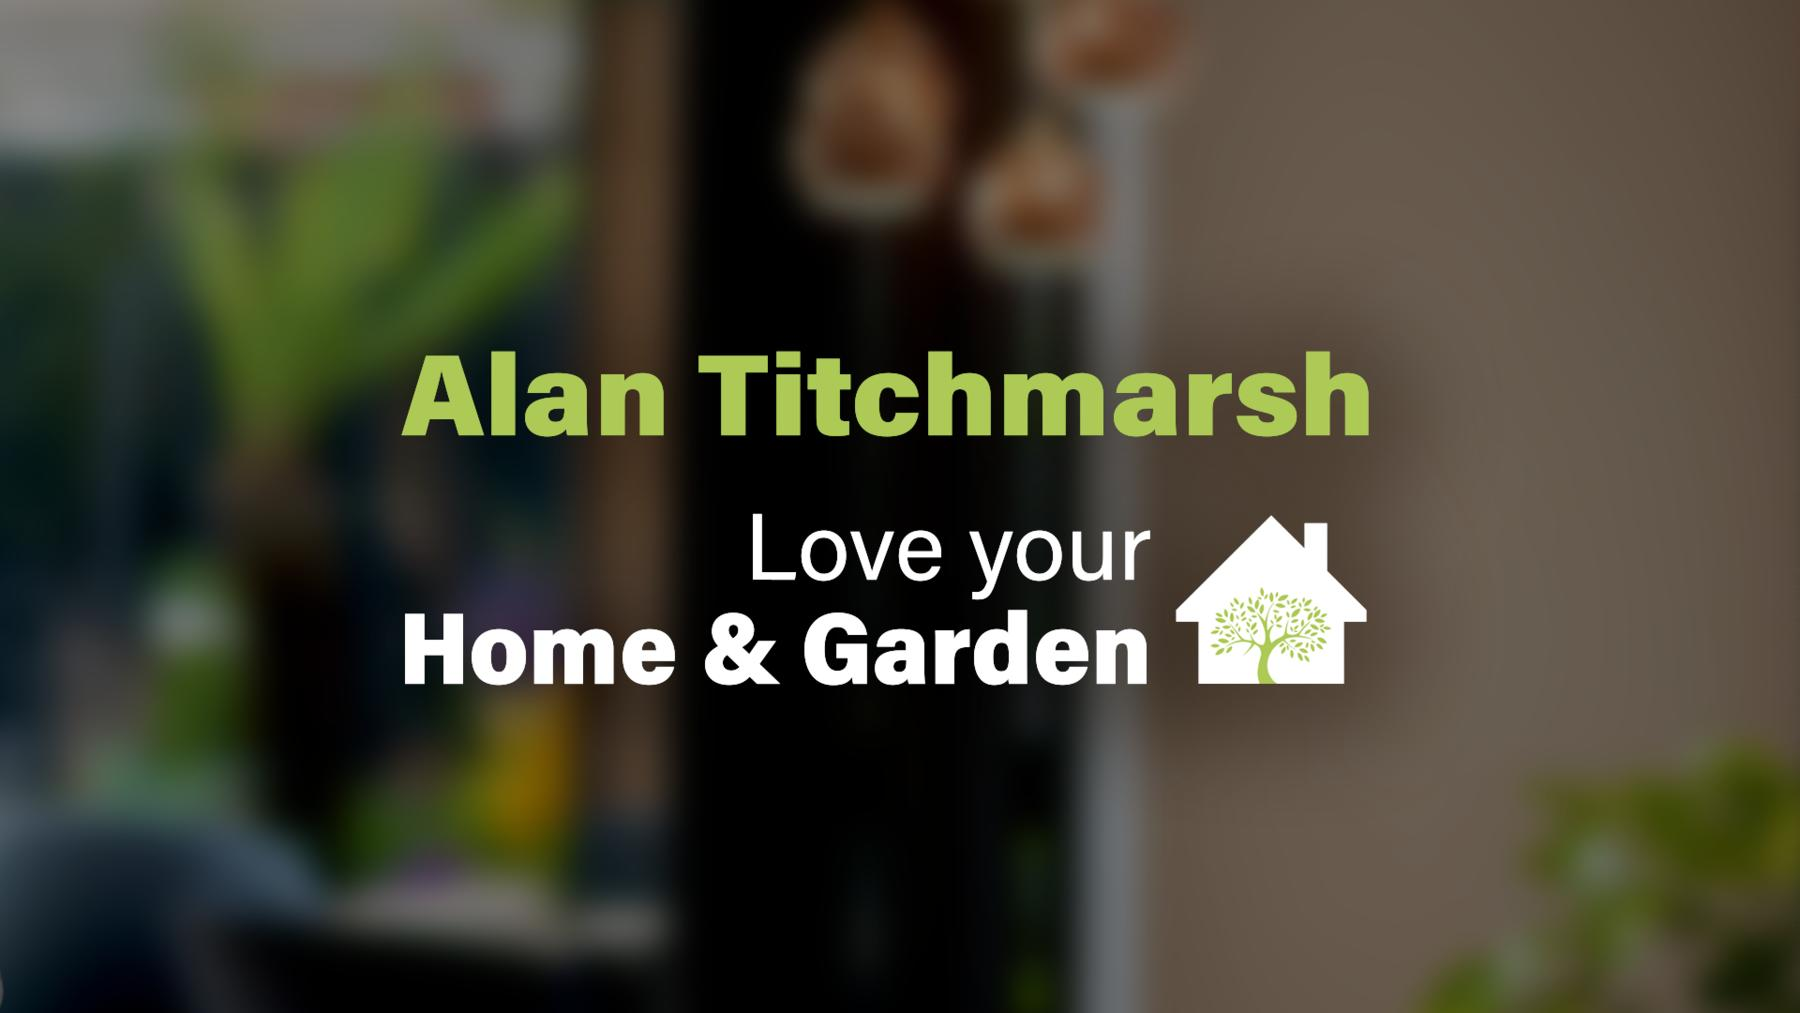 Alan Titchmarsh - Love your Home & Garden